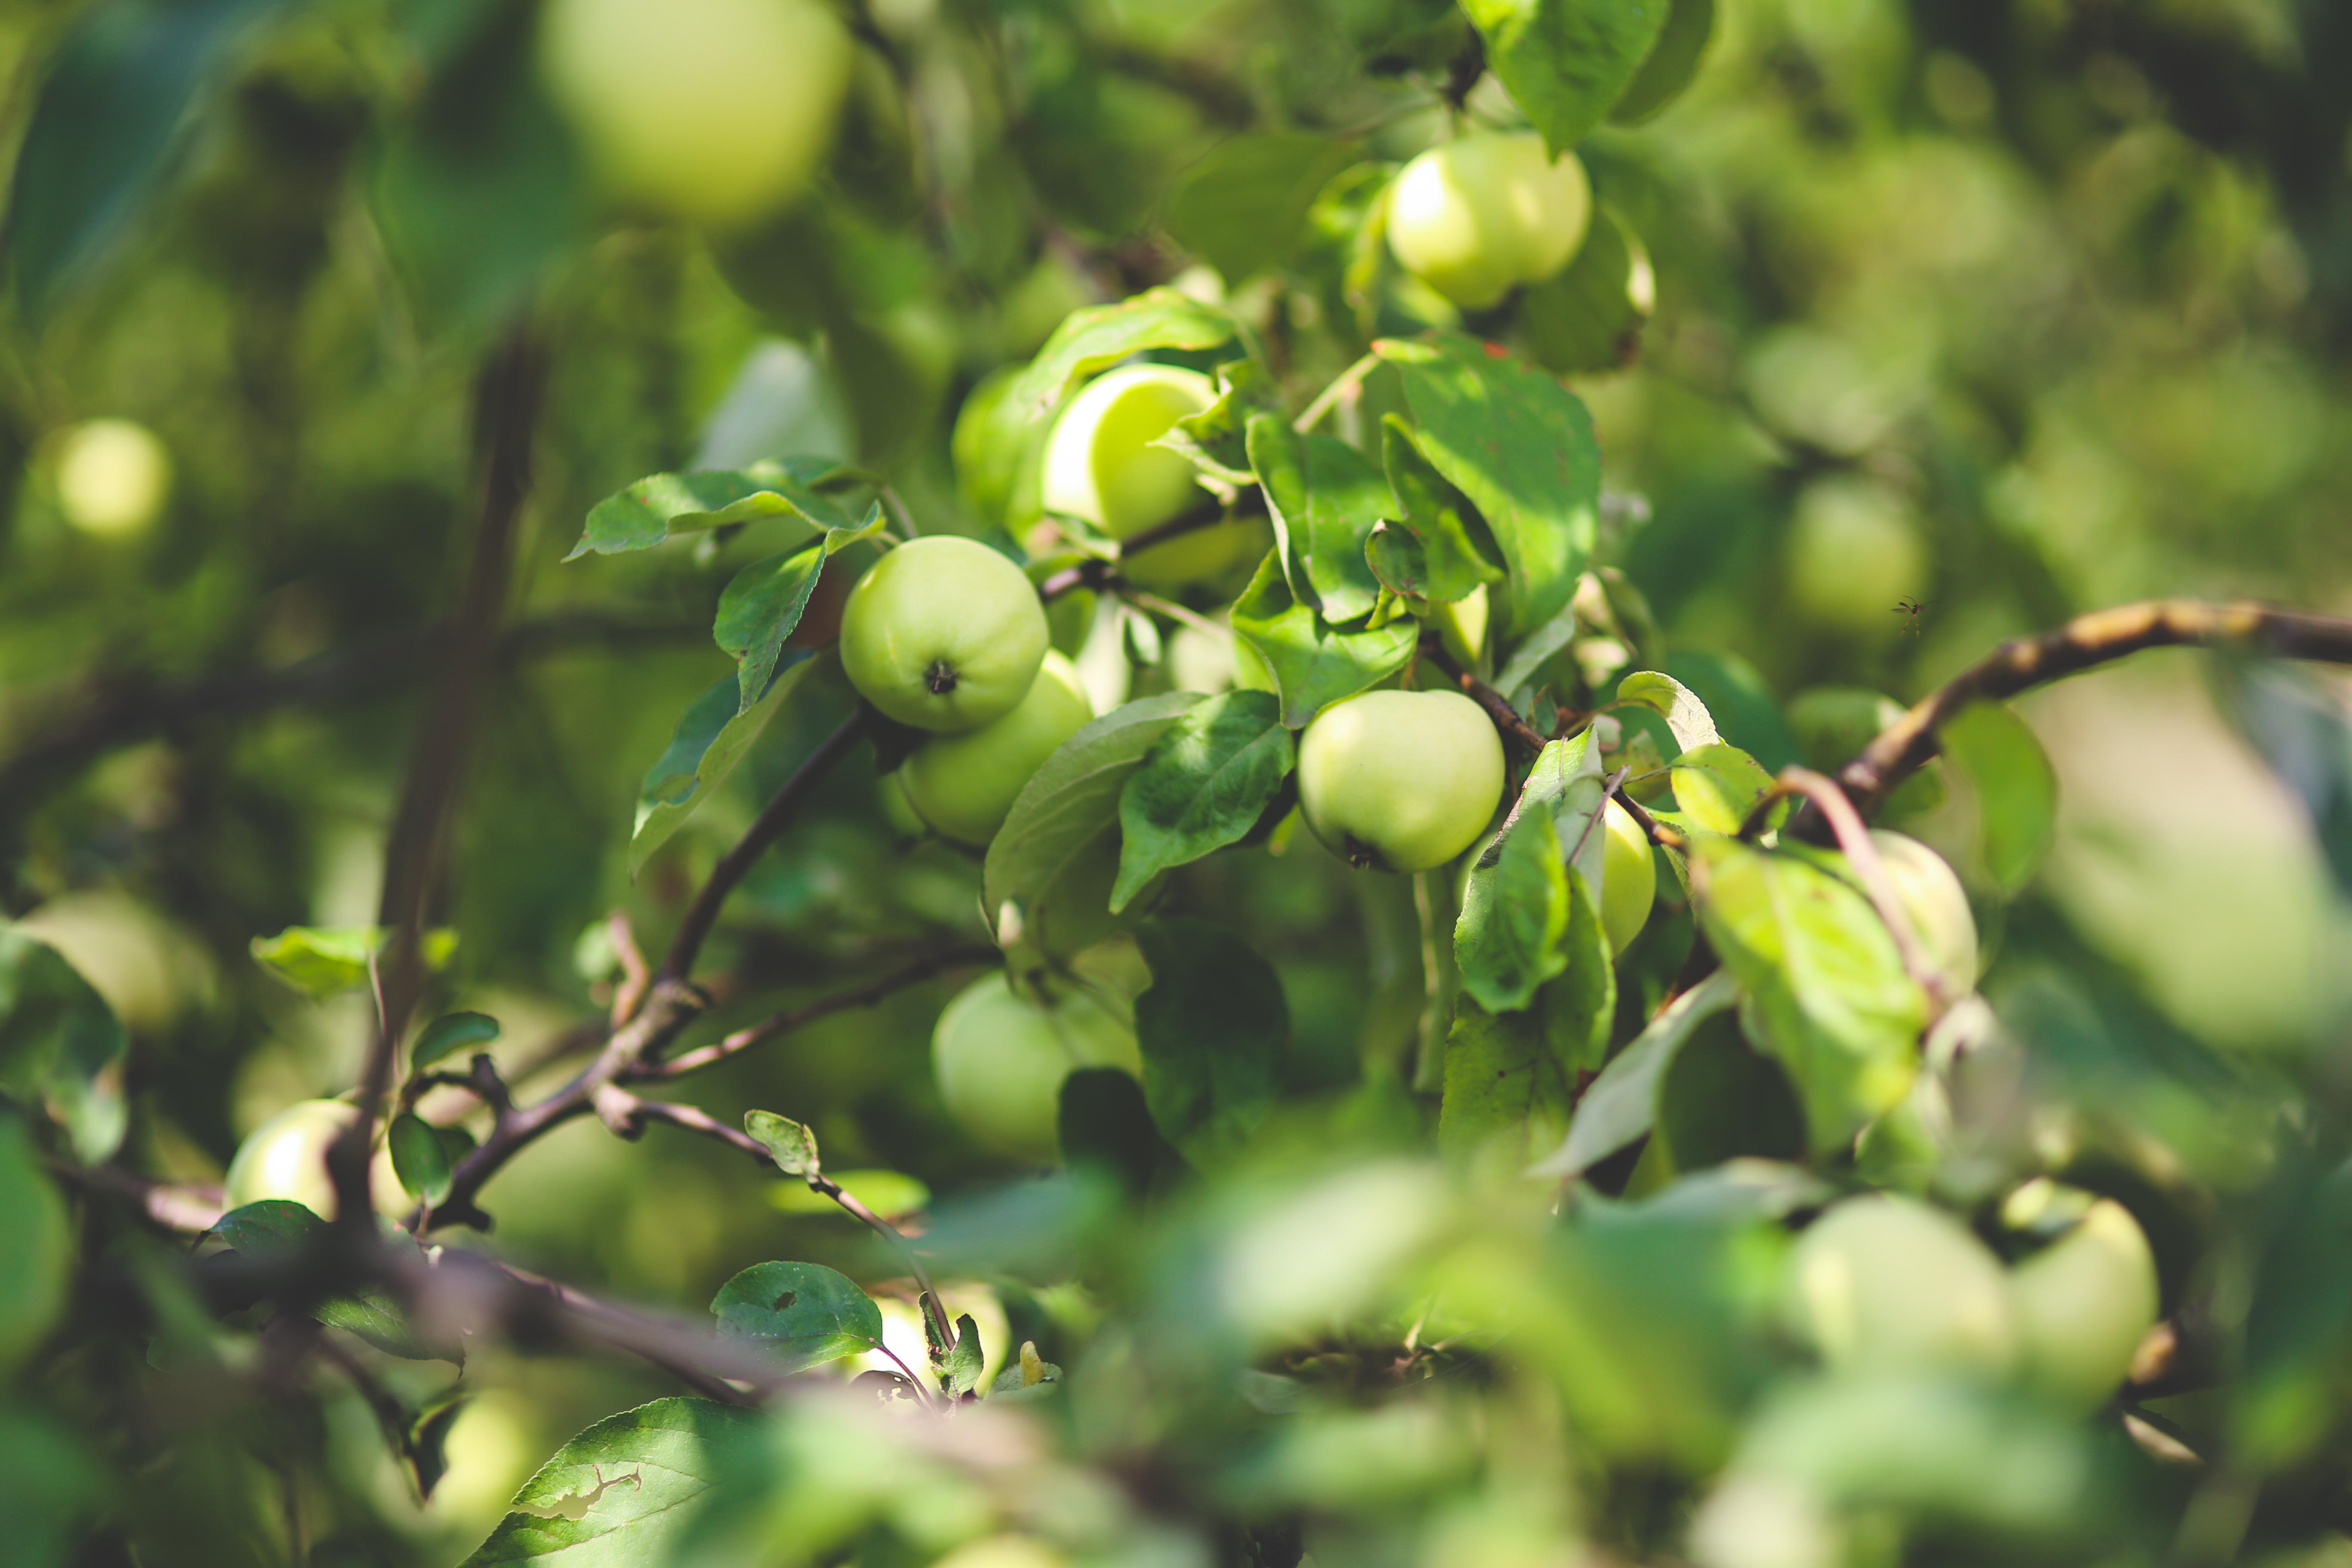 Green apple · Free Stock Photo